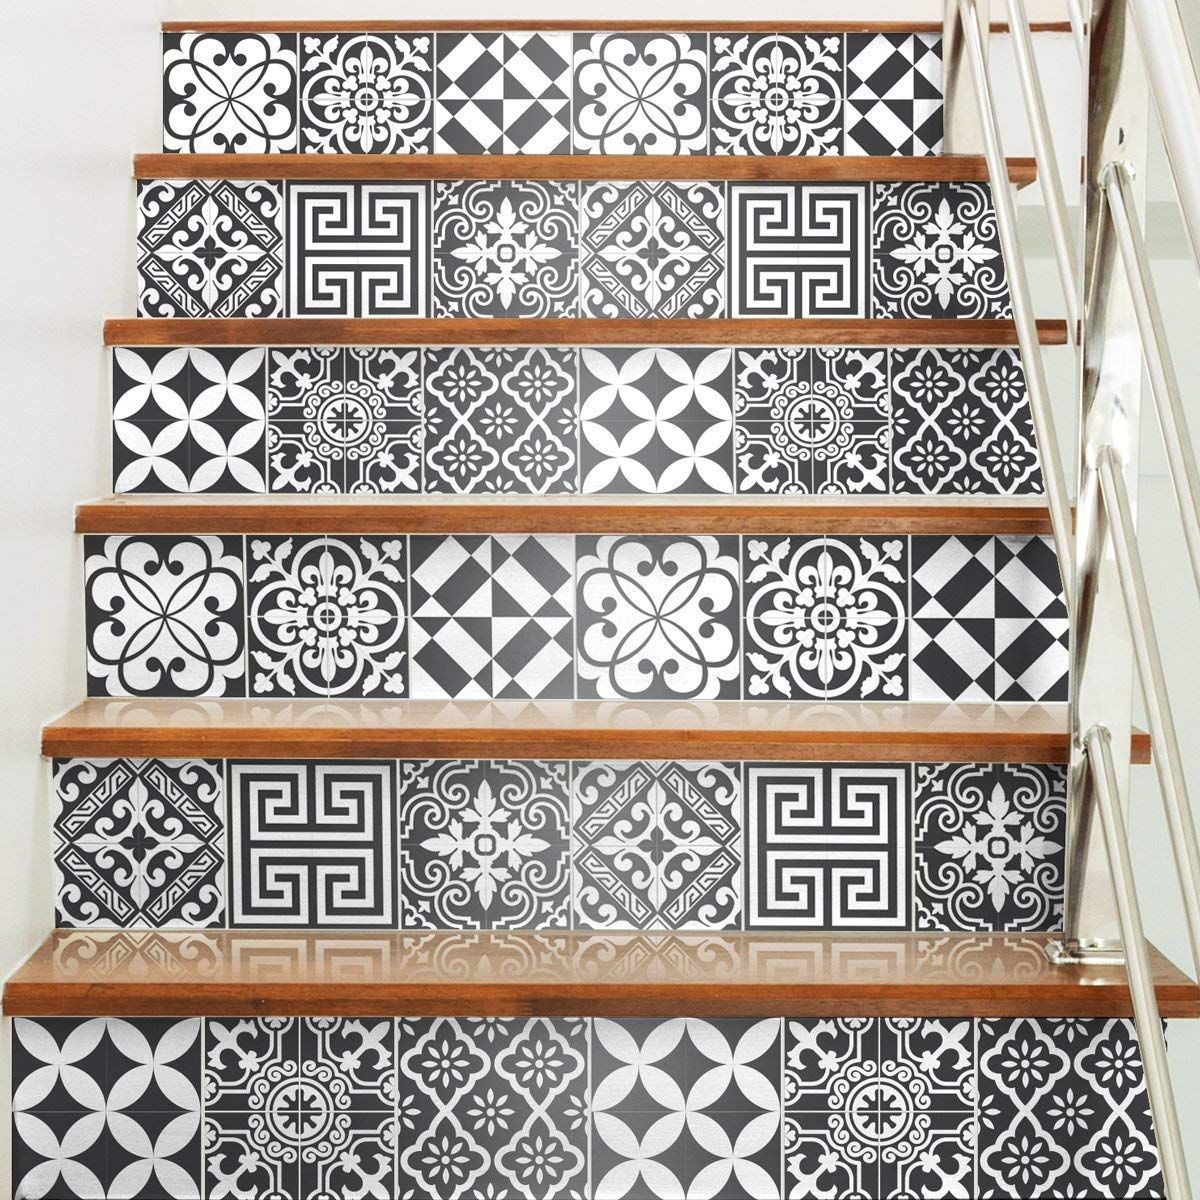 15 x 15 cm 60 pi/èces Stickers adh/ésifs carrelages muraux azulejos